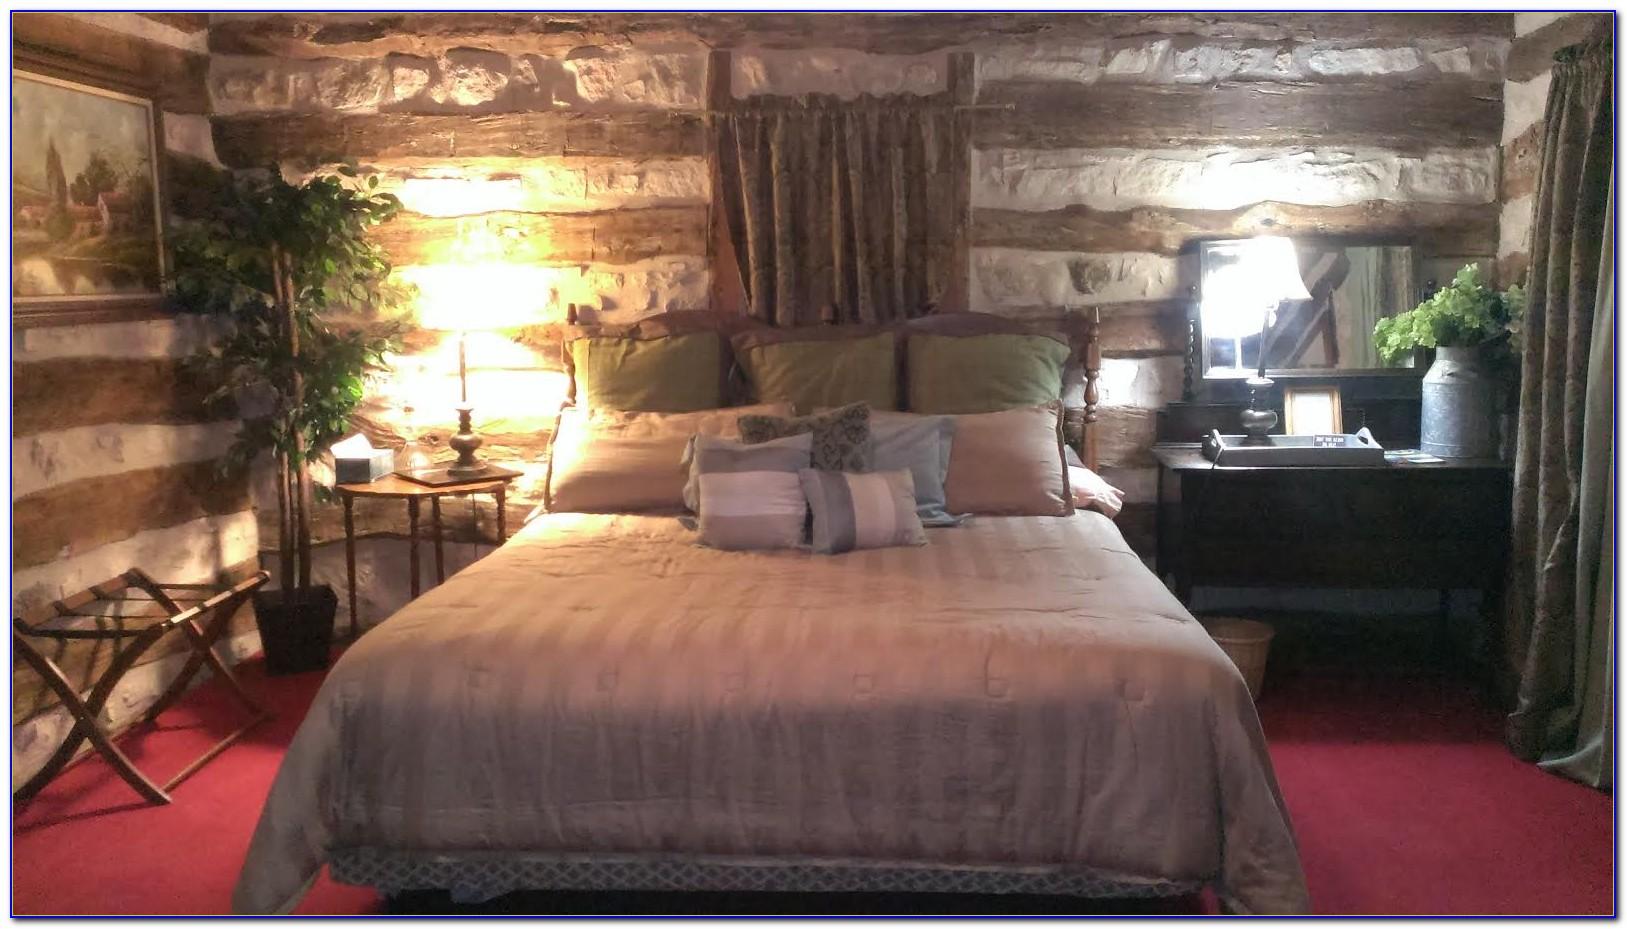 Fredericksburg Texas Bed And Breakfast Hot Tub